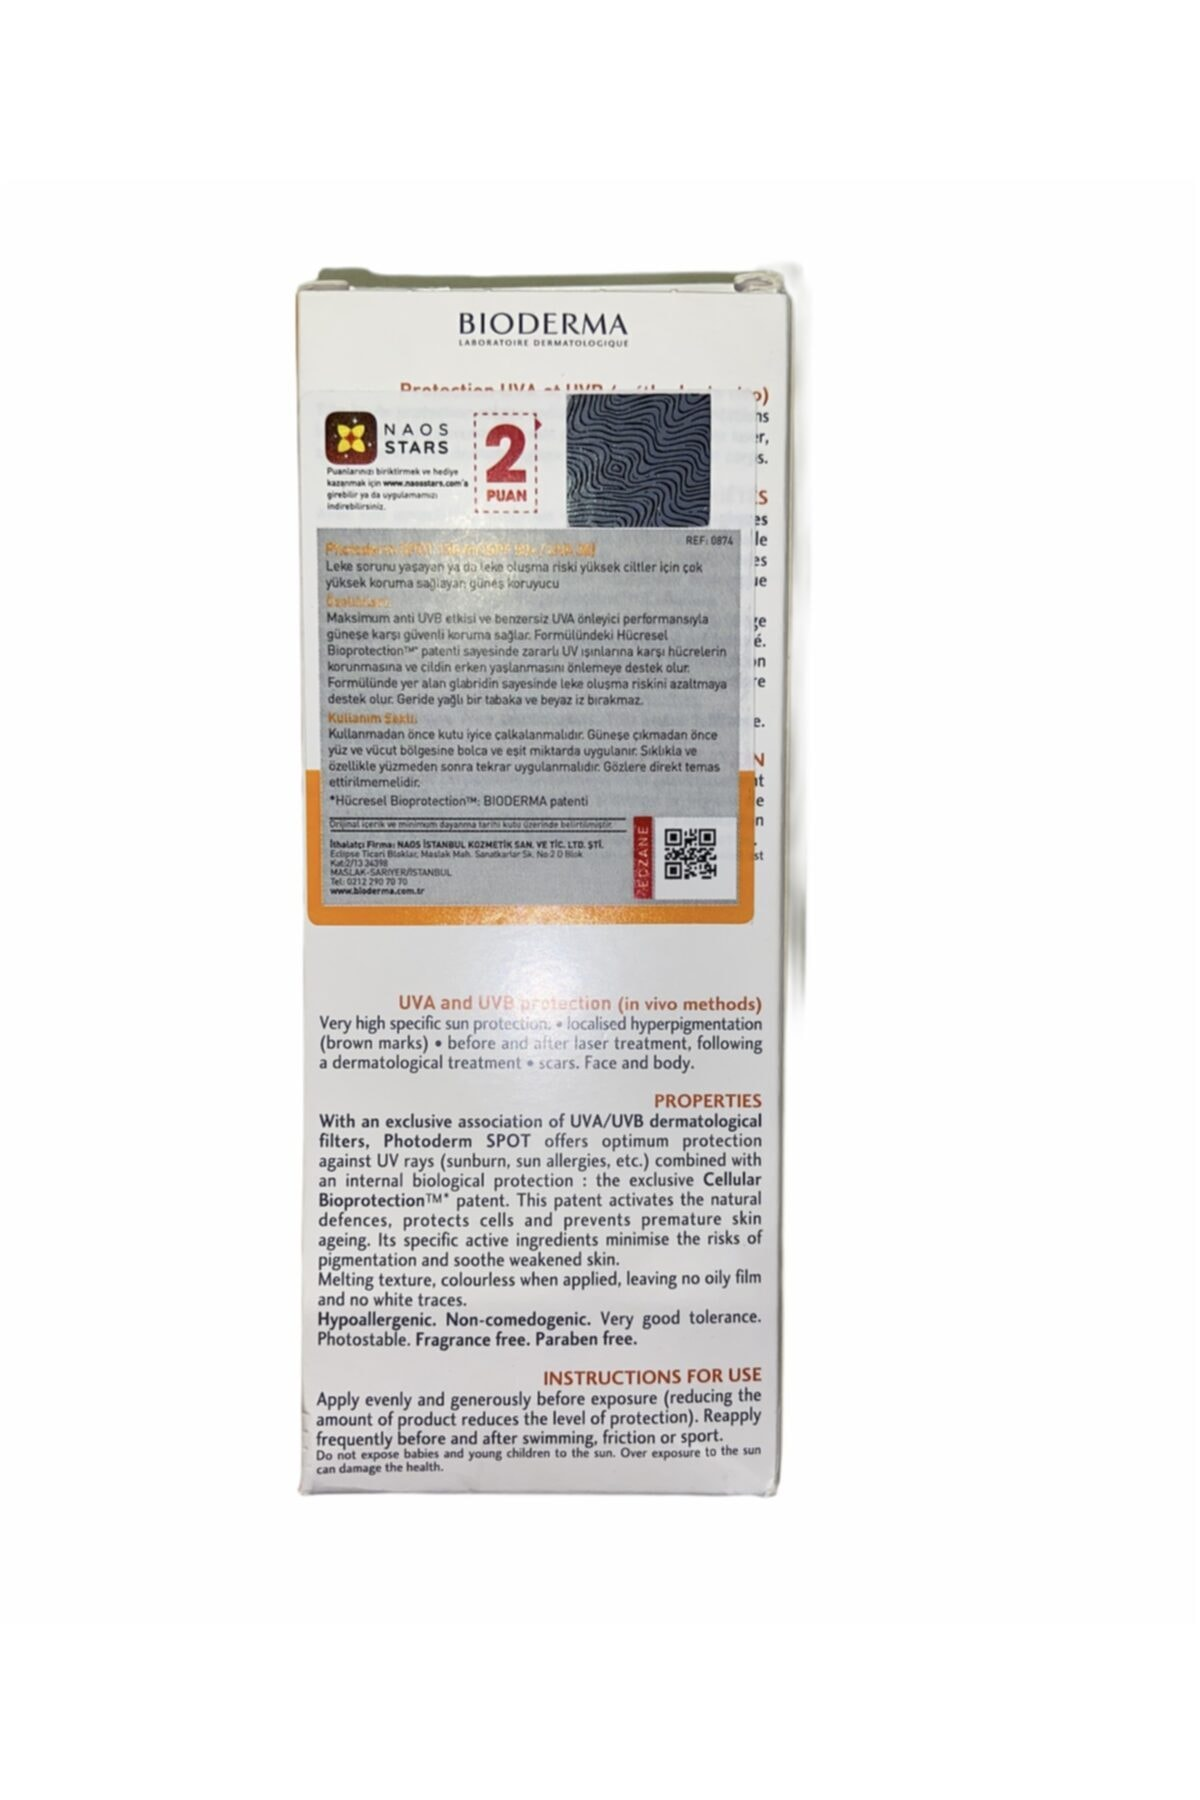 Bioderma 500ml Sensibio H2o Hediyeli - Photoderm Spot Spf 50+ Leke Karşıtı Güneş Kremi 150ml Skt2022 2